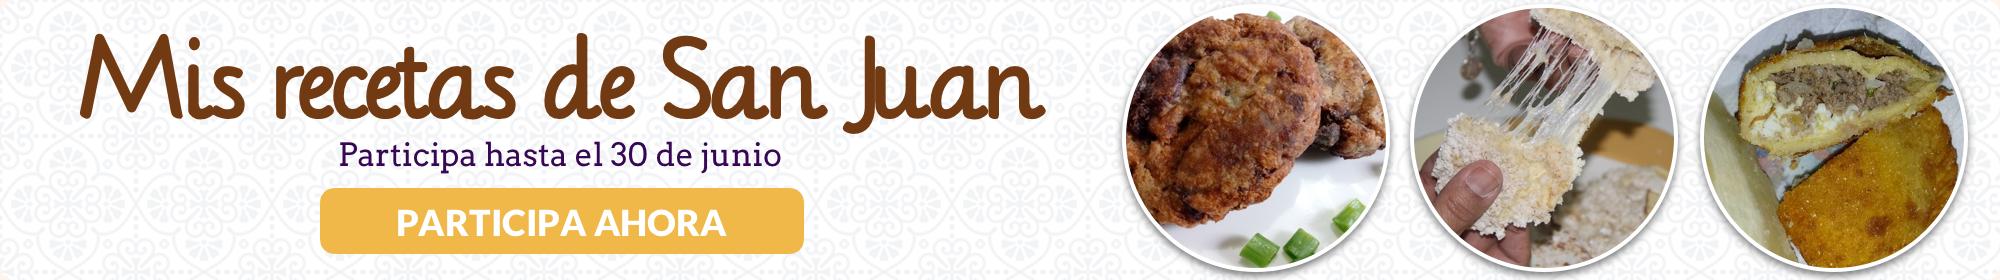 Mis recetas de San Juan